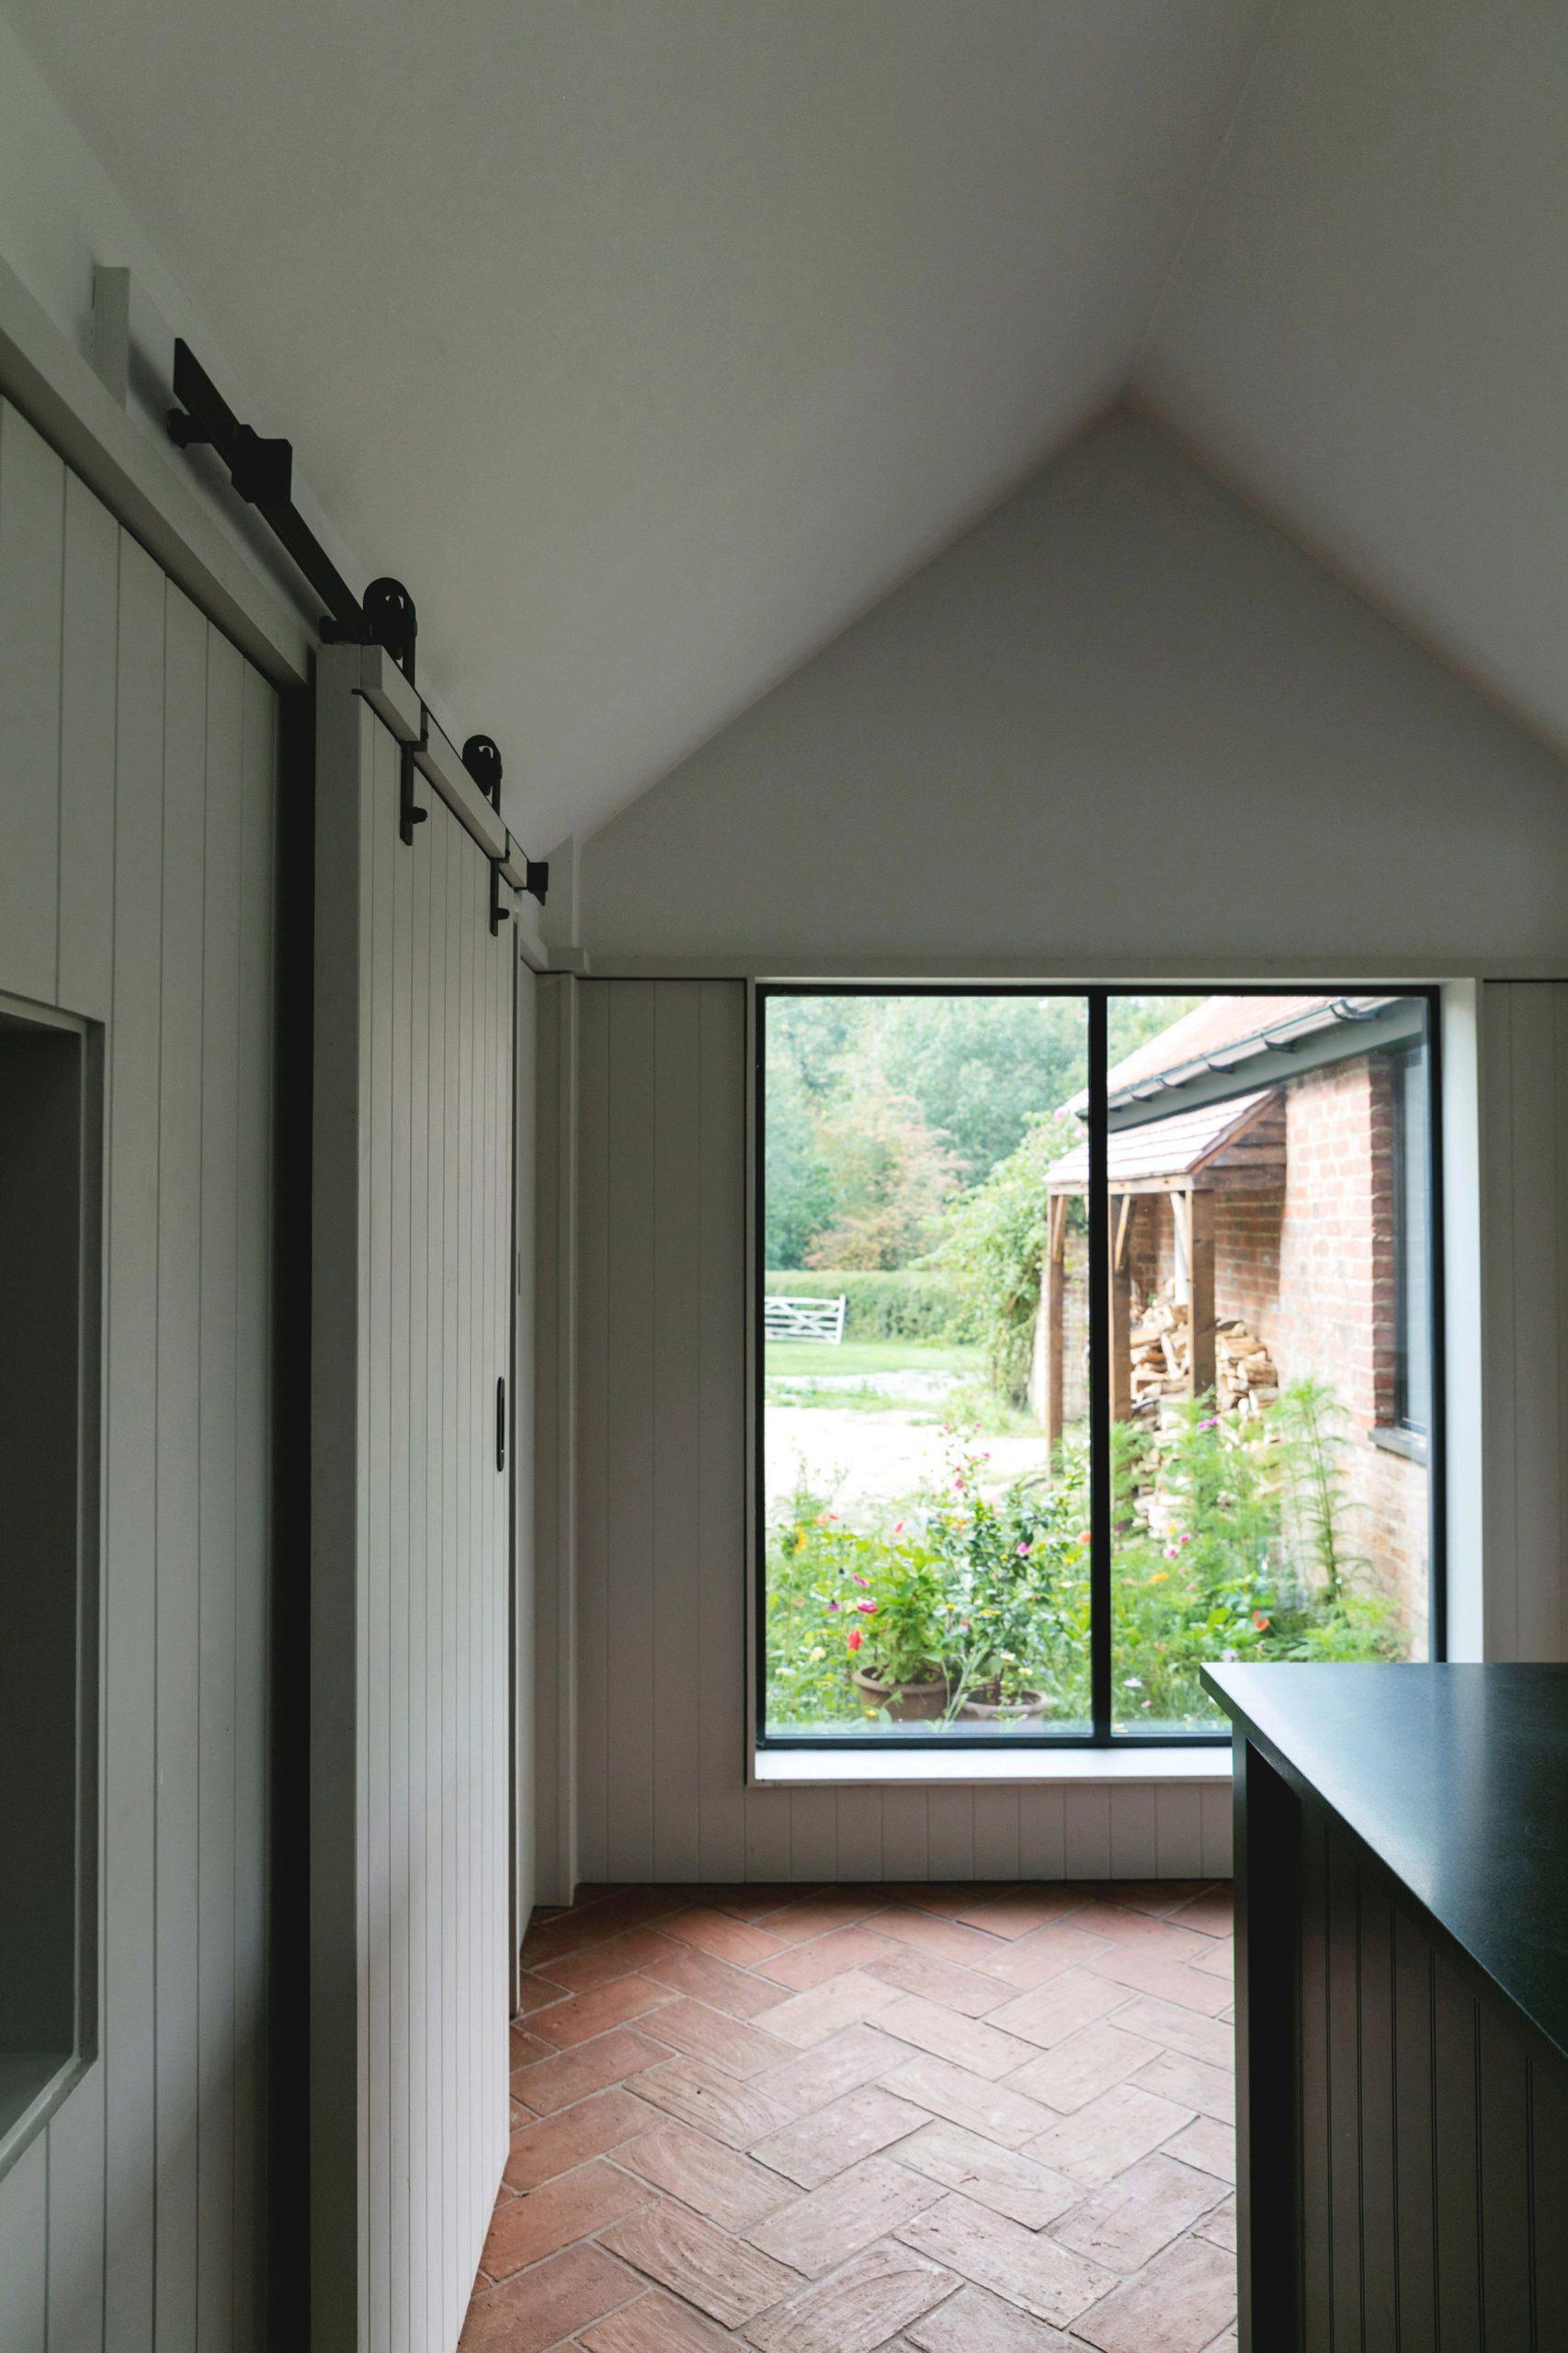 Window of Farley Farmhouse by Emil Eve Architects